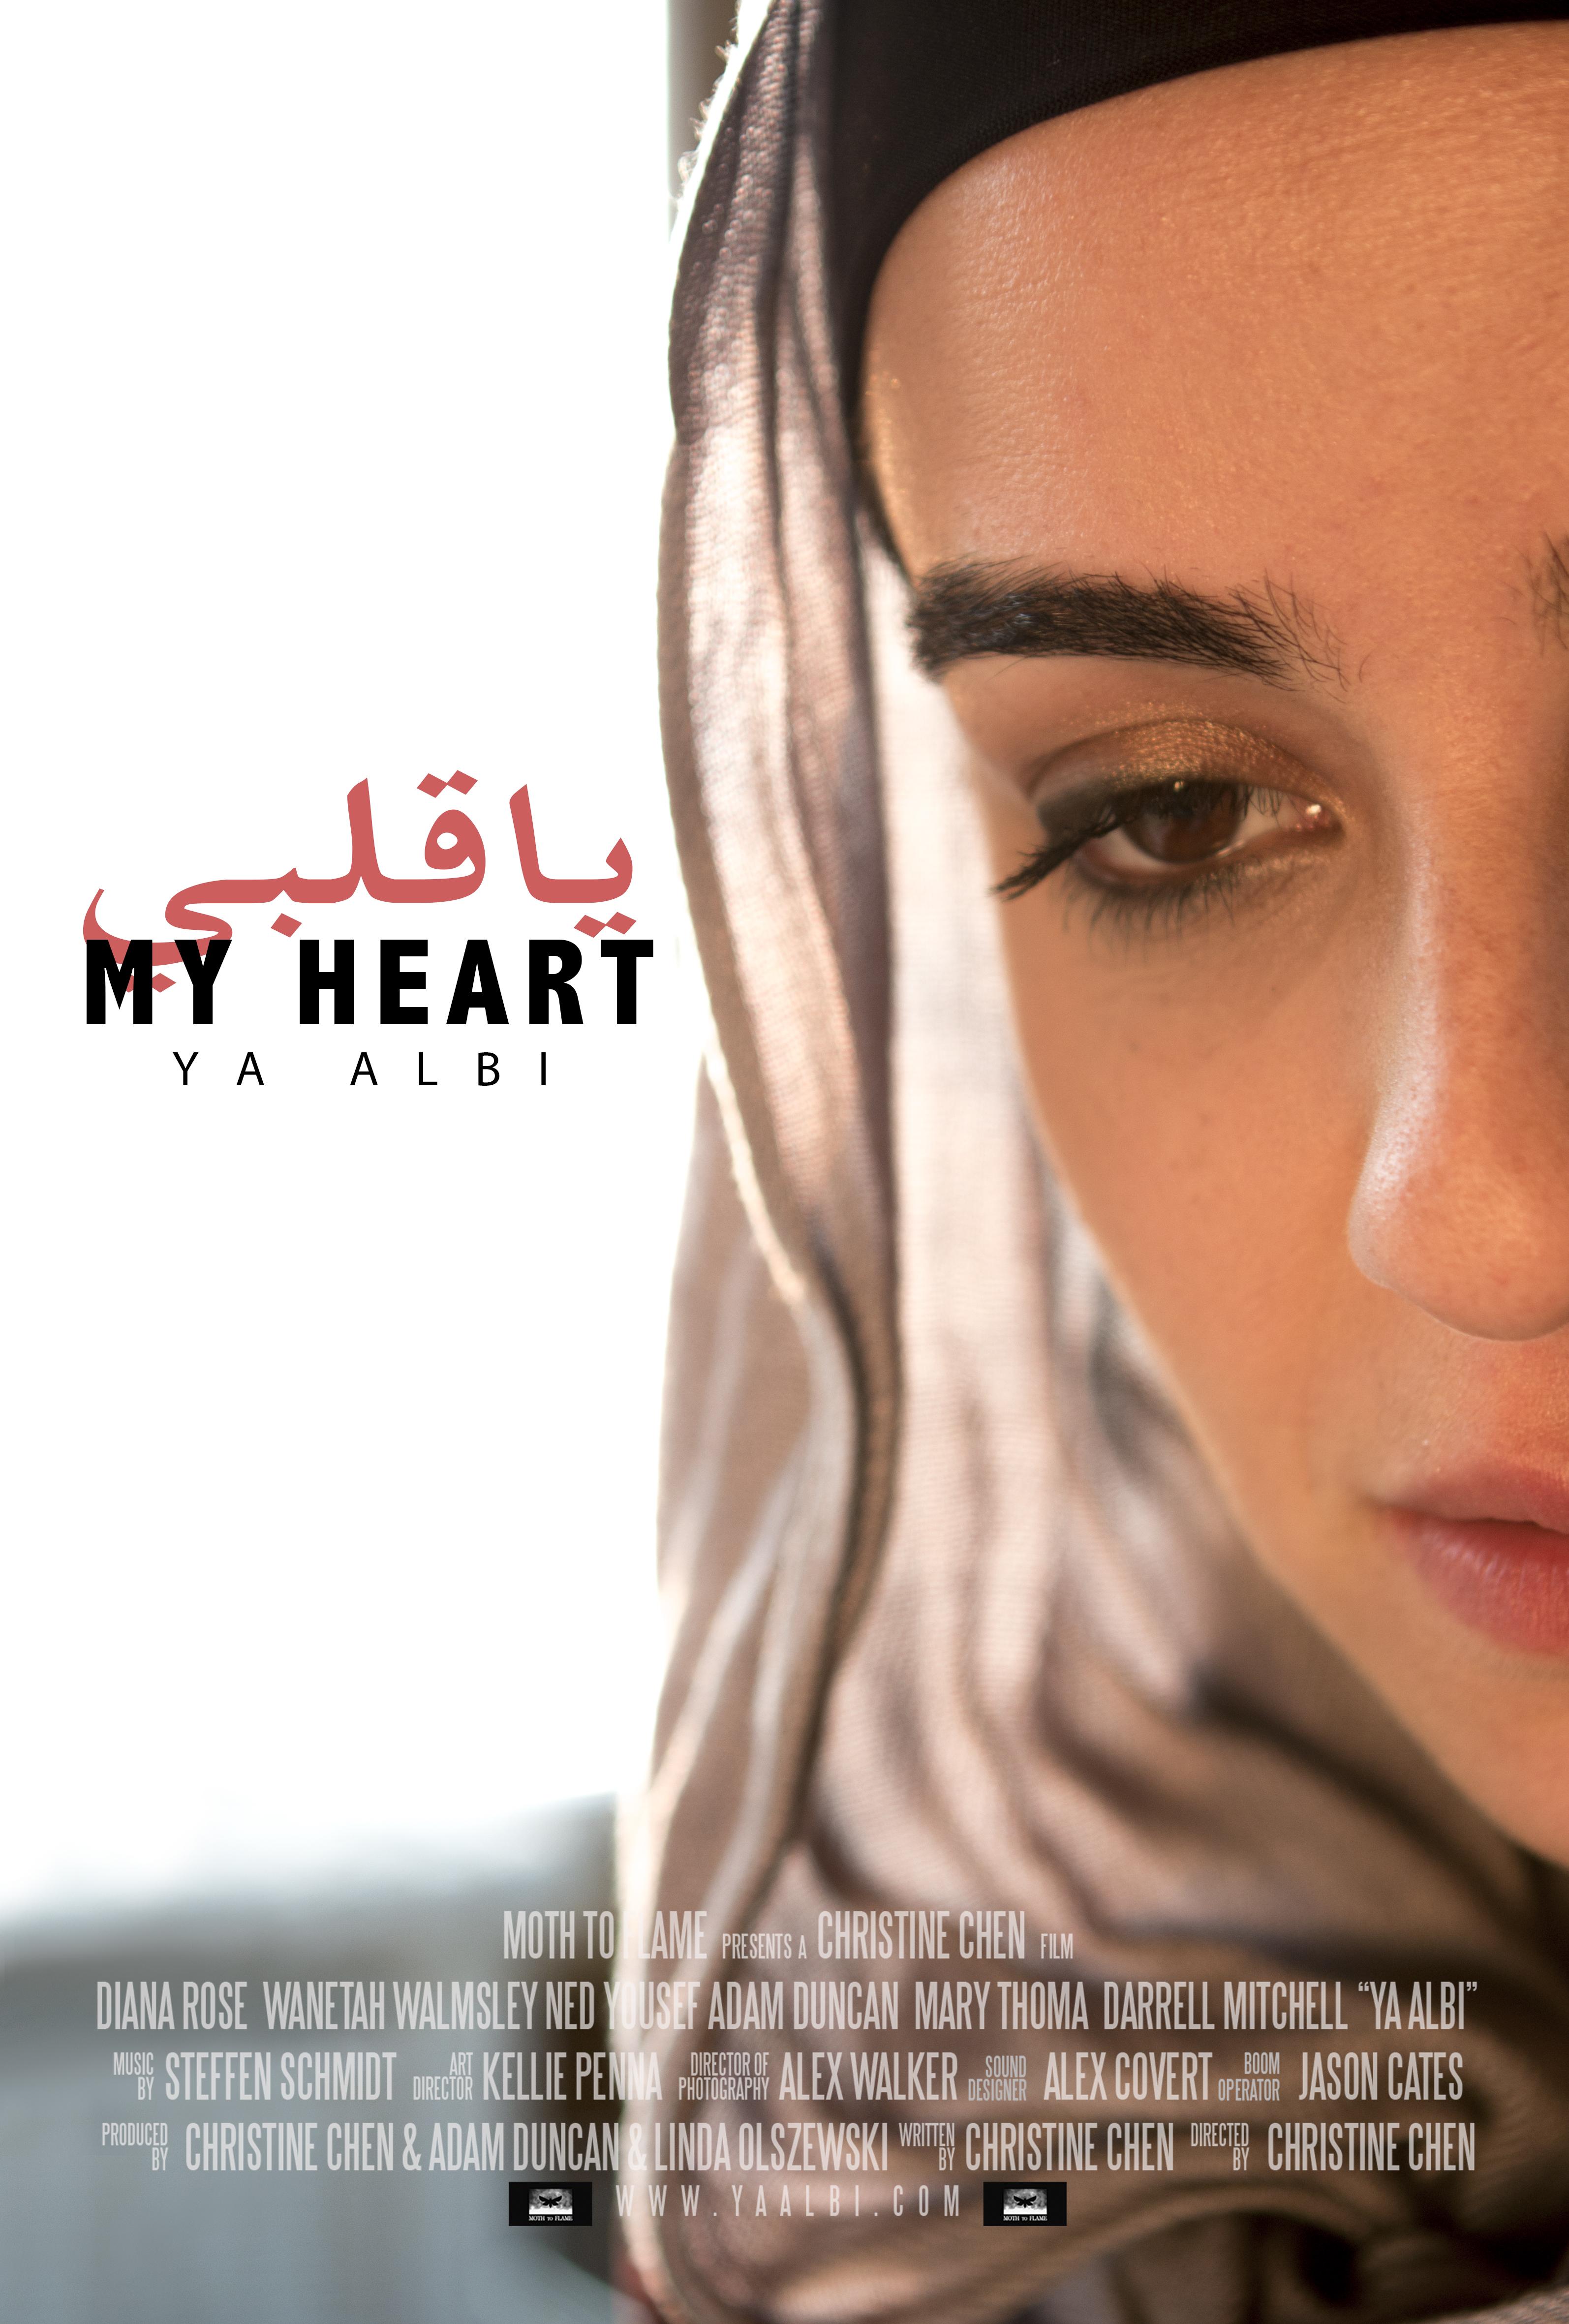 My Heart – Ya Albi